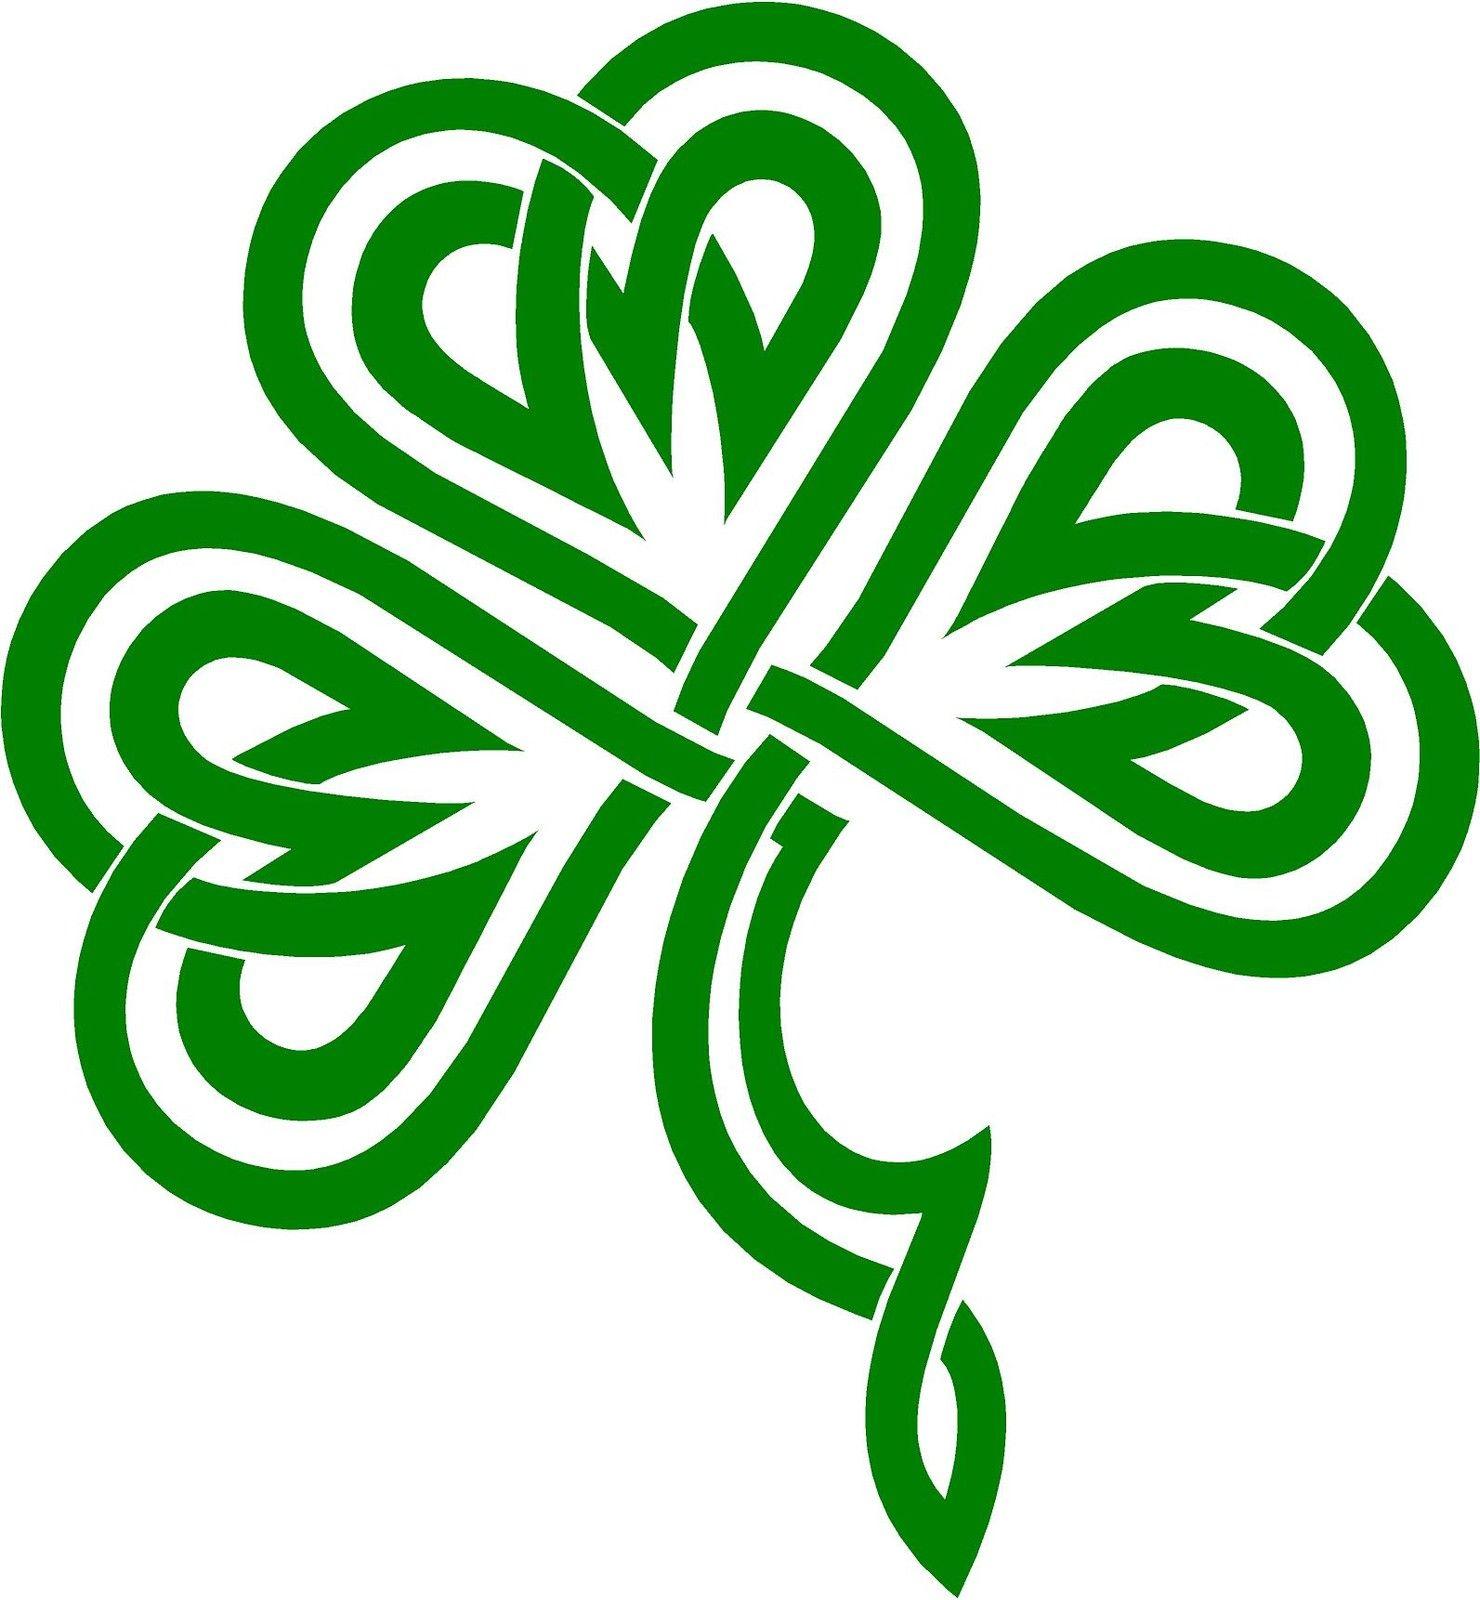 Celtic Design - ClipArt Best